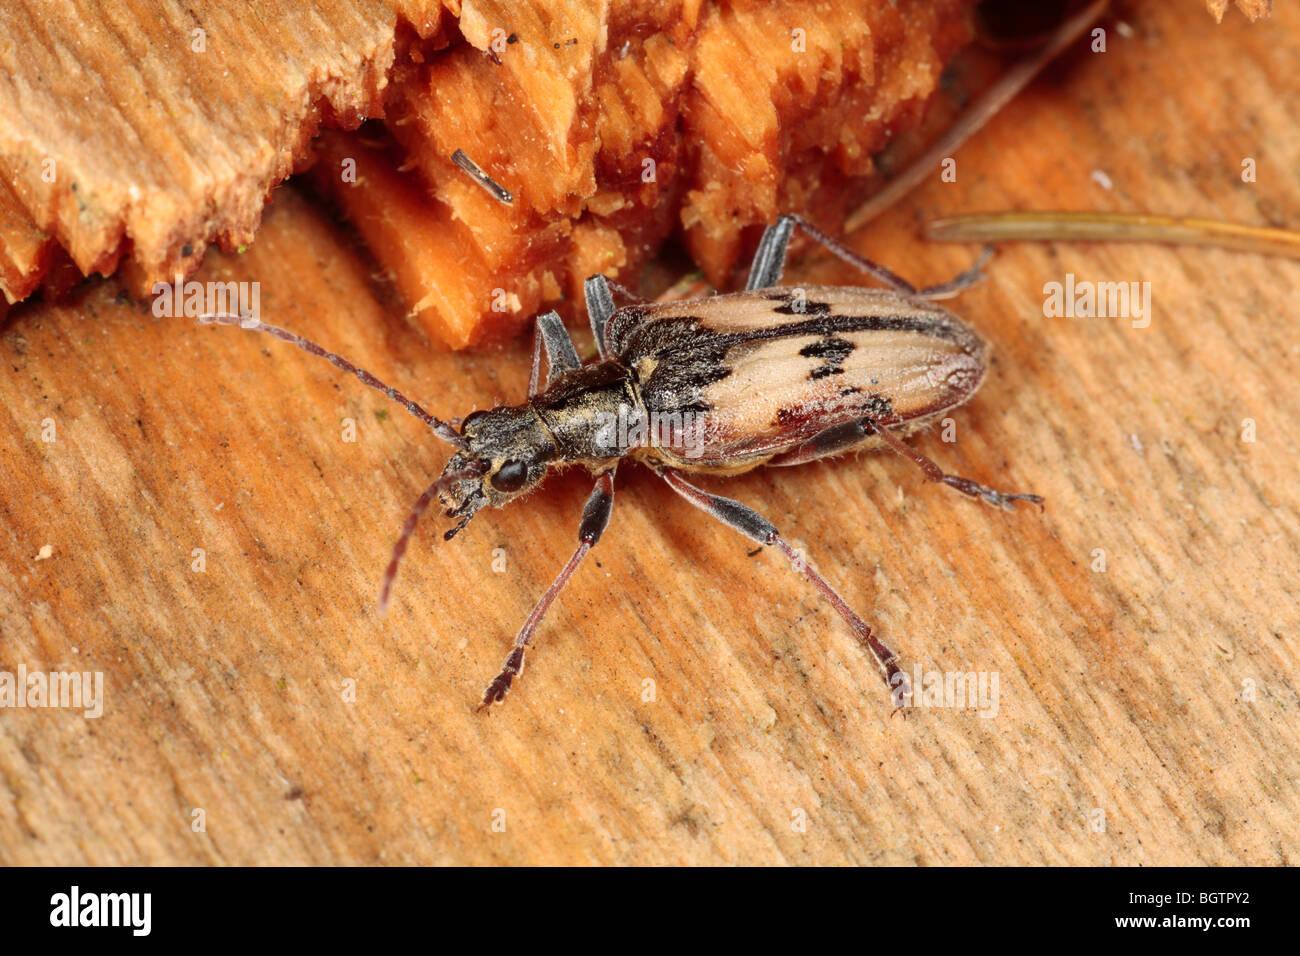 Zwei-banded Longhorn Beetle (Rhagium Bifasciatum) auf abgestorbenem Holz. Powys, Wales. Stockbild